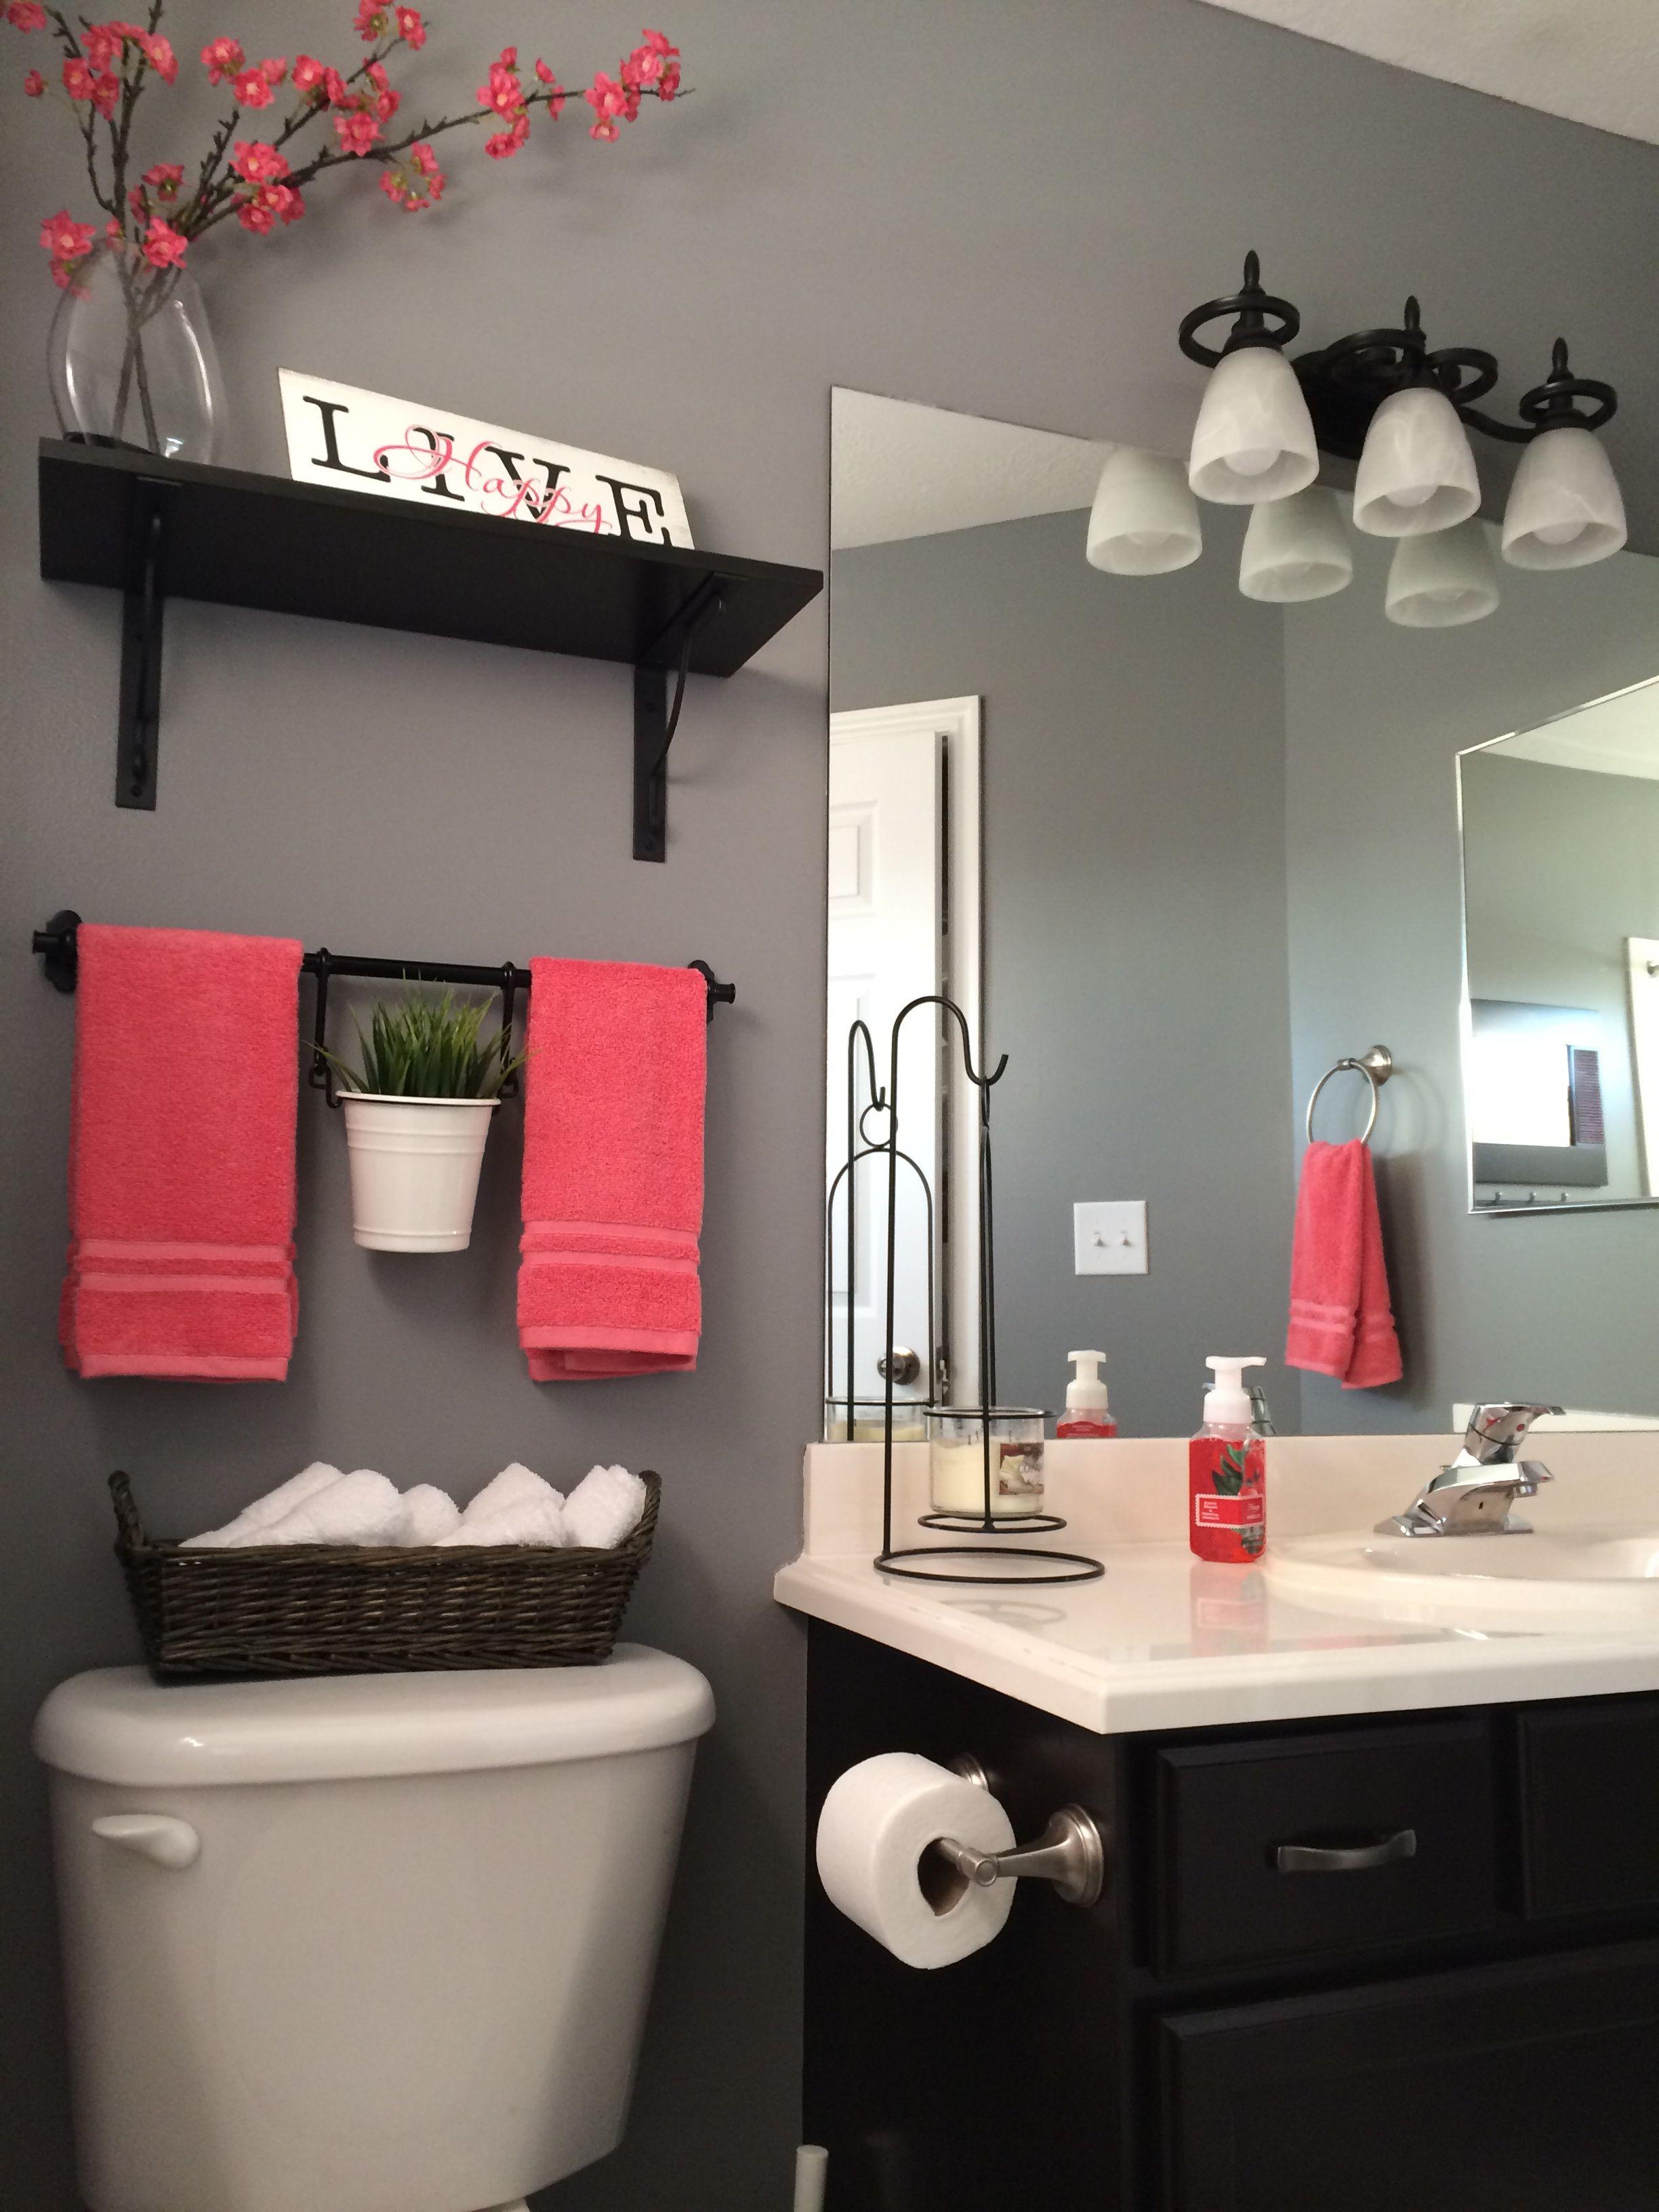 Badezimmer dekor in hobby lobby blog  bathroom ideas  pinterest  hobby lobby decor ikea shelves